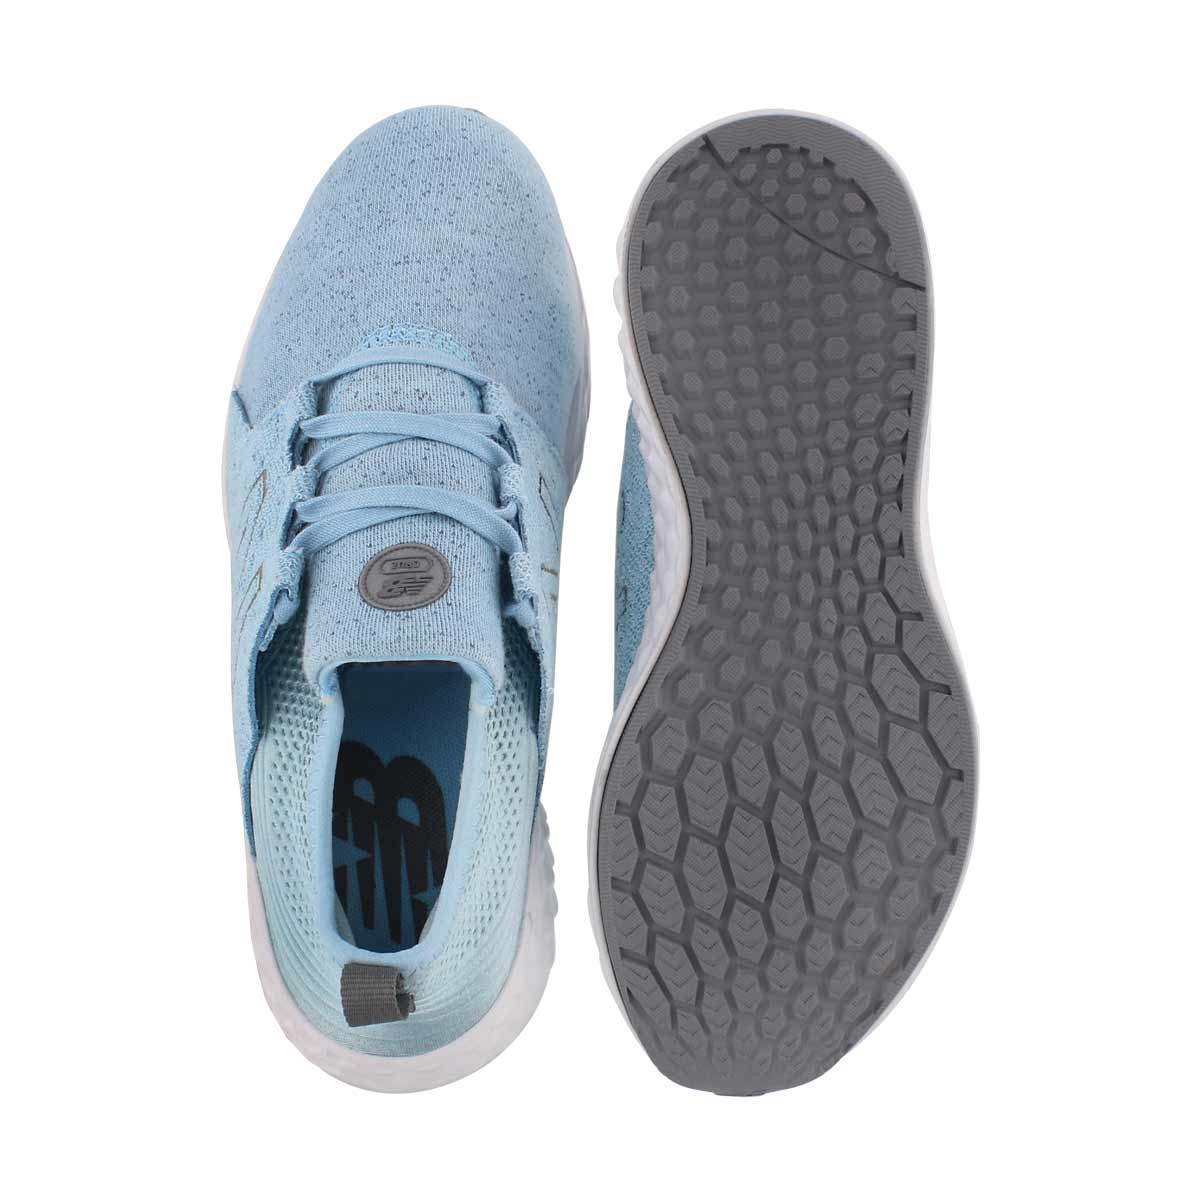 Grls Cruz sky/gunmetal sneaker-wide